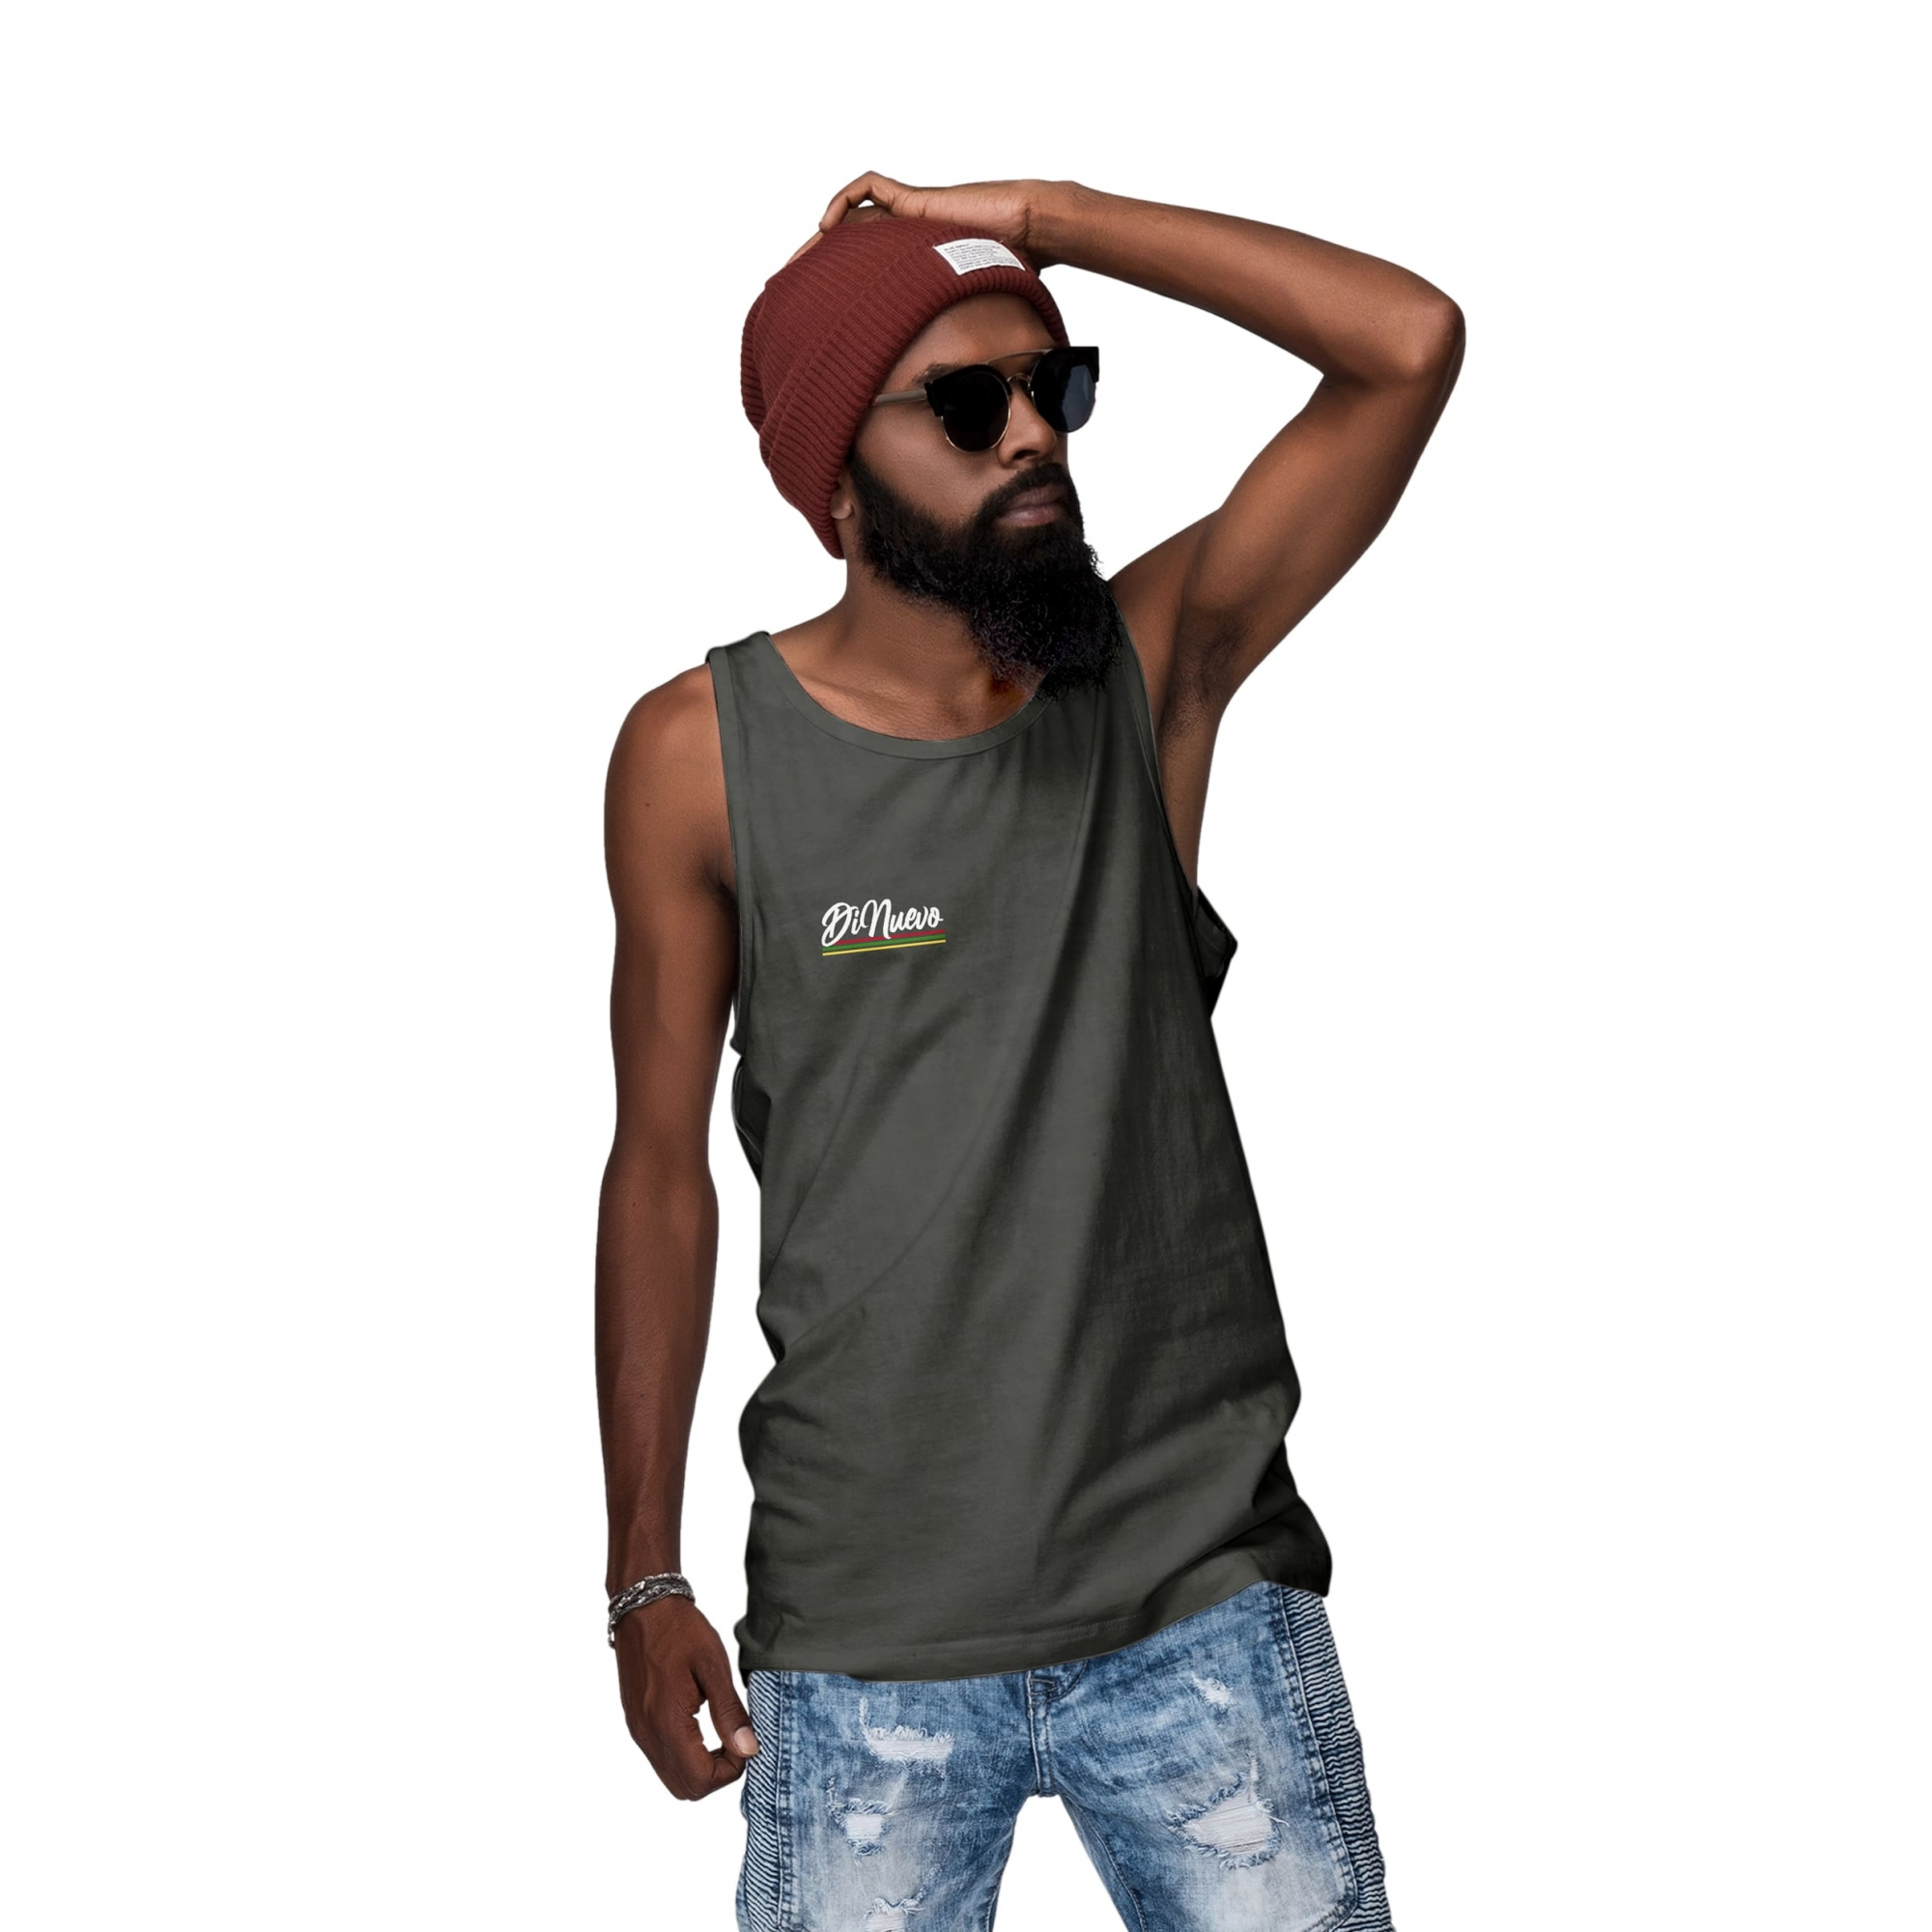 Camiseta Regata Masculina Di Nuevo Listras Reggae